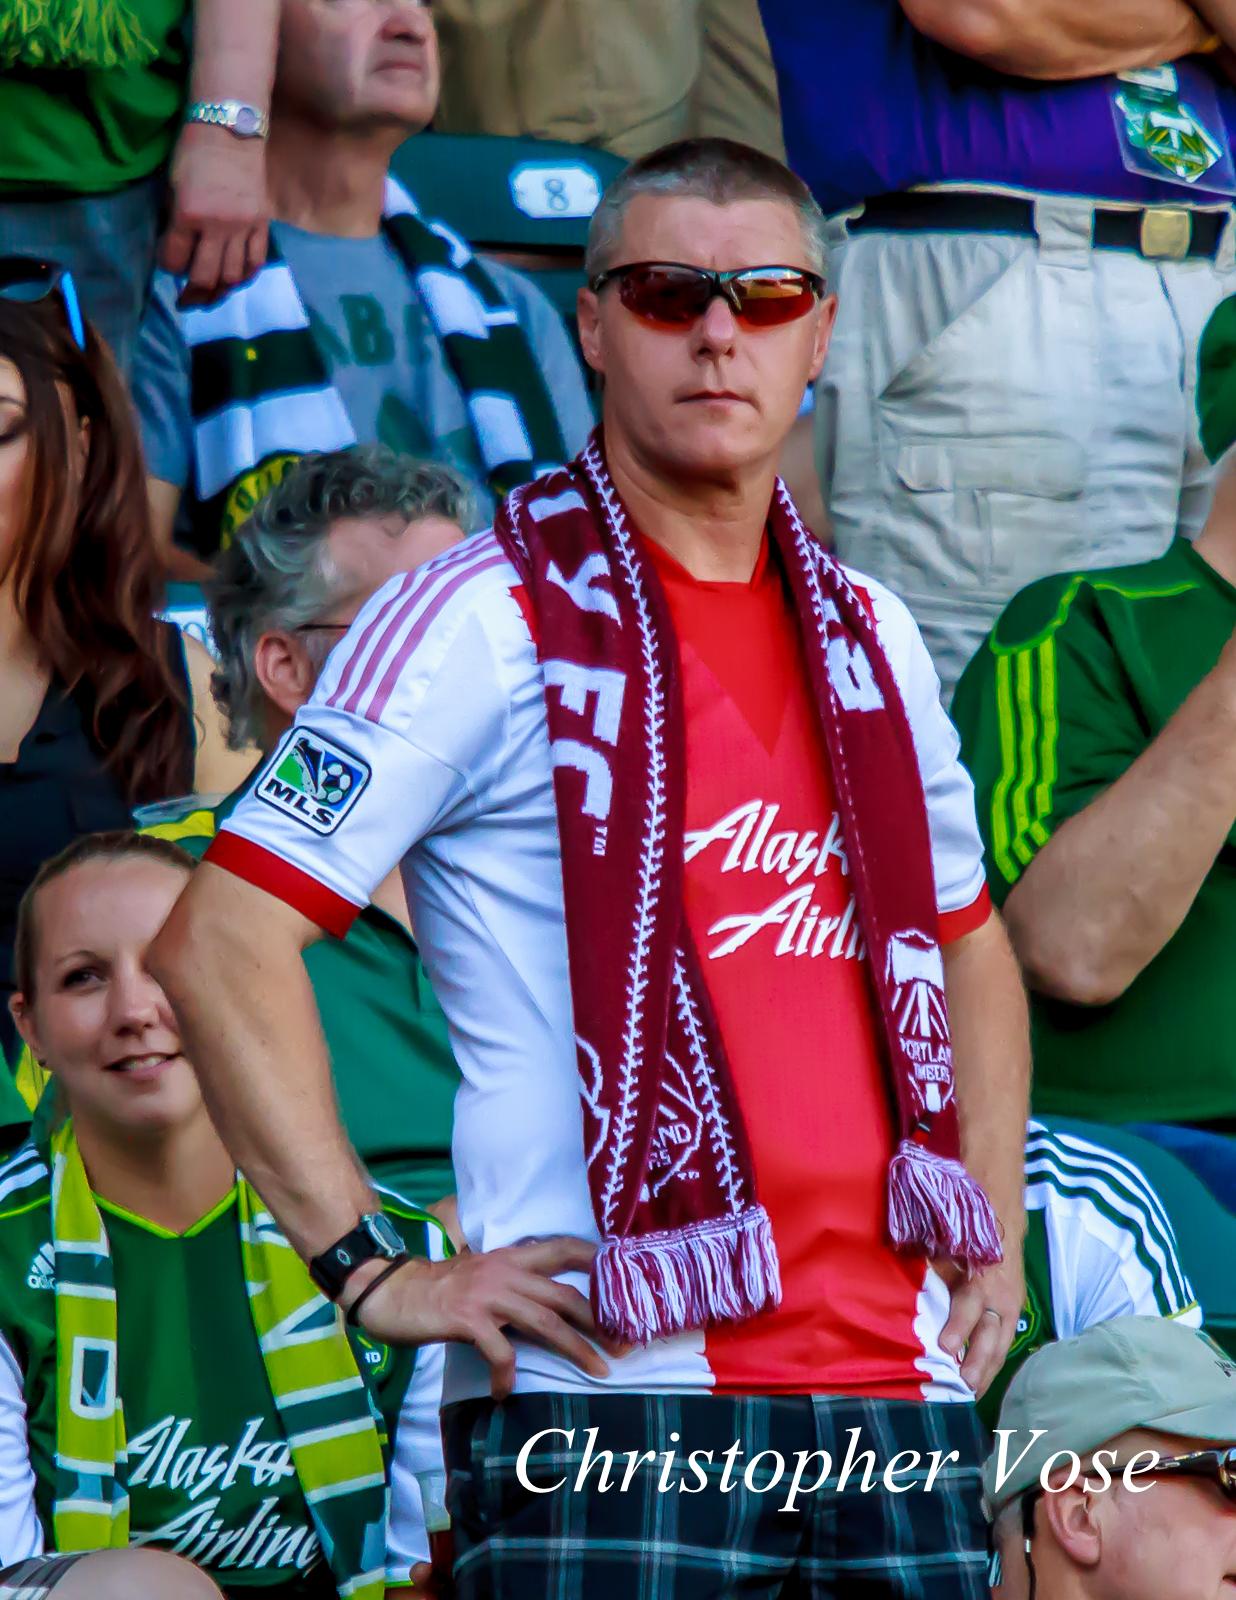 2014-09-20 Portland Timbers Supporter 1.jpg